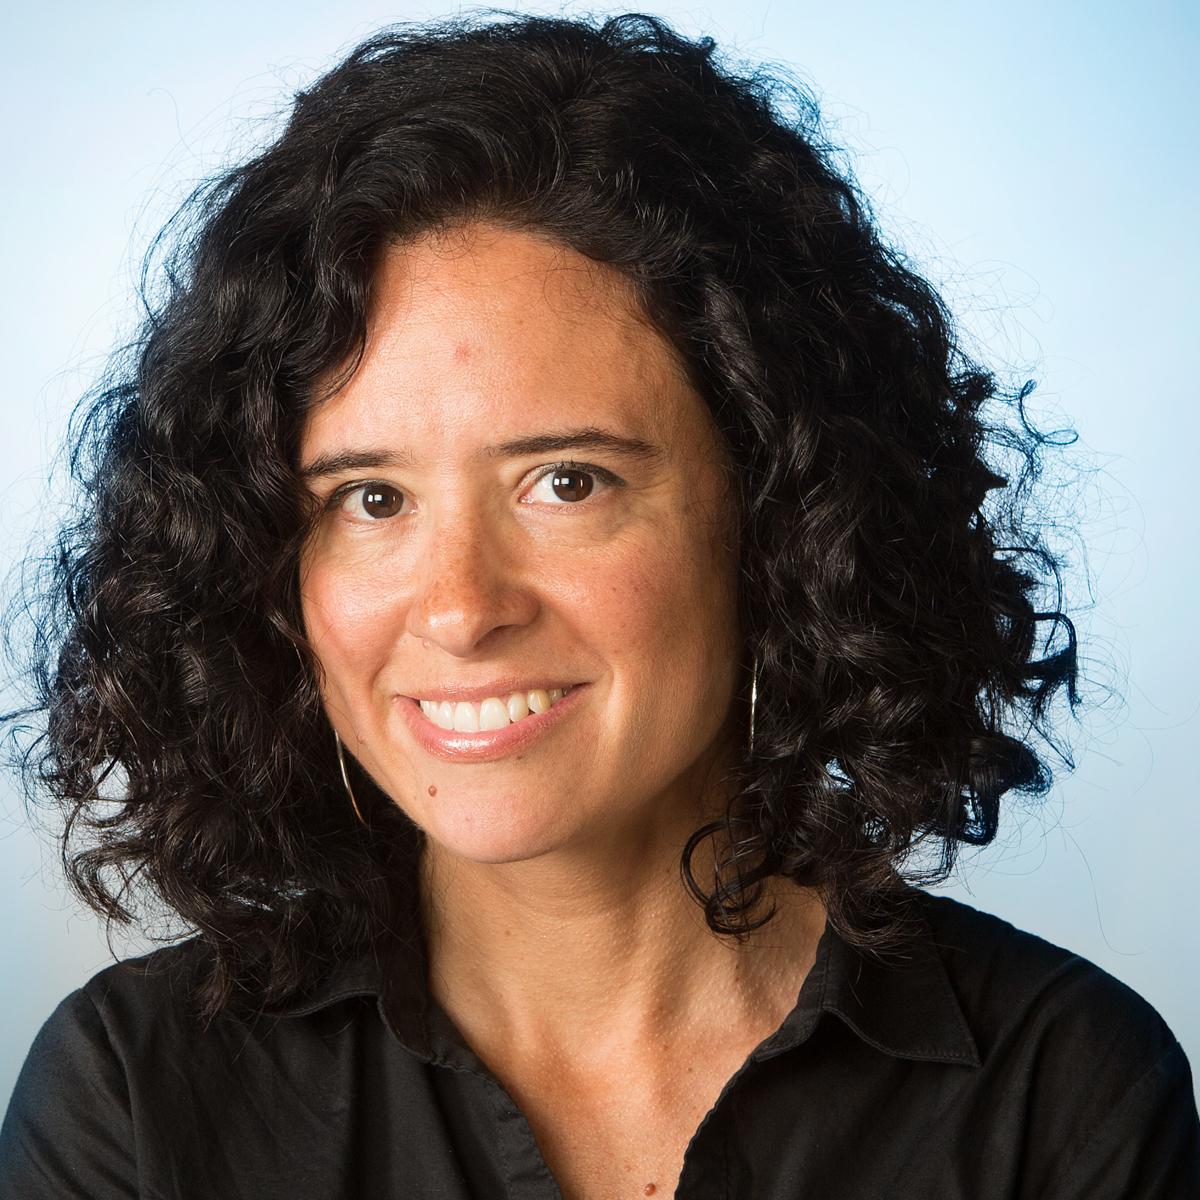 Los Angeles Times staff writer Carolina Miranda. Photo by Mel Melcon.